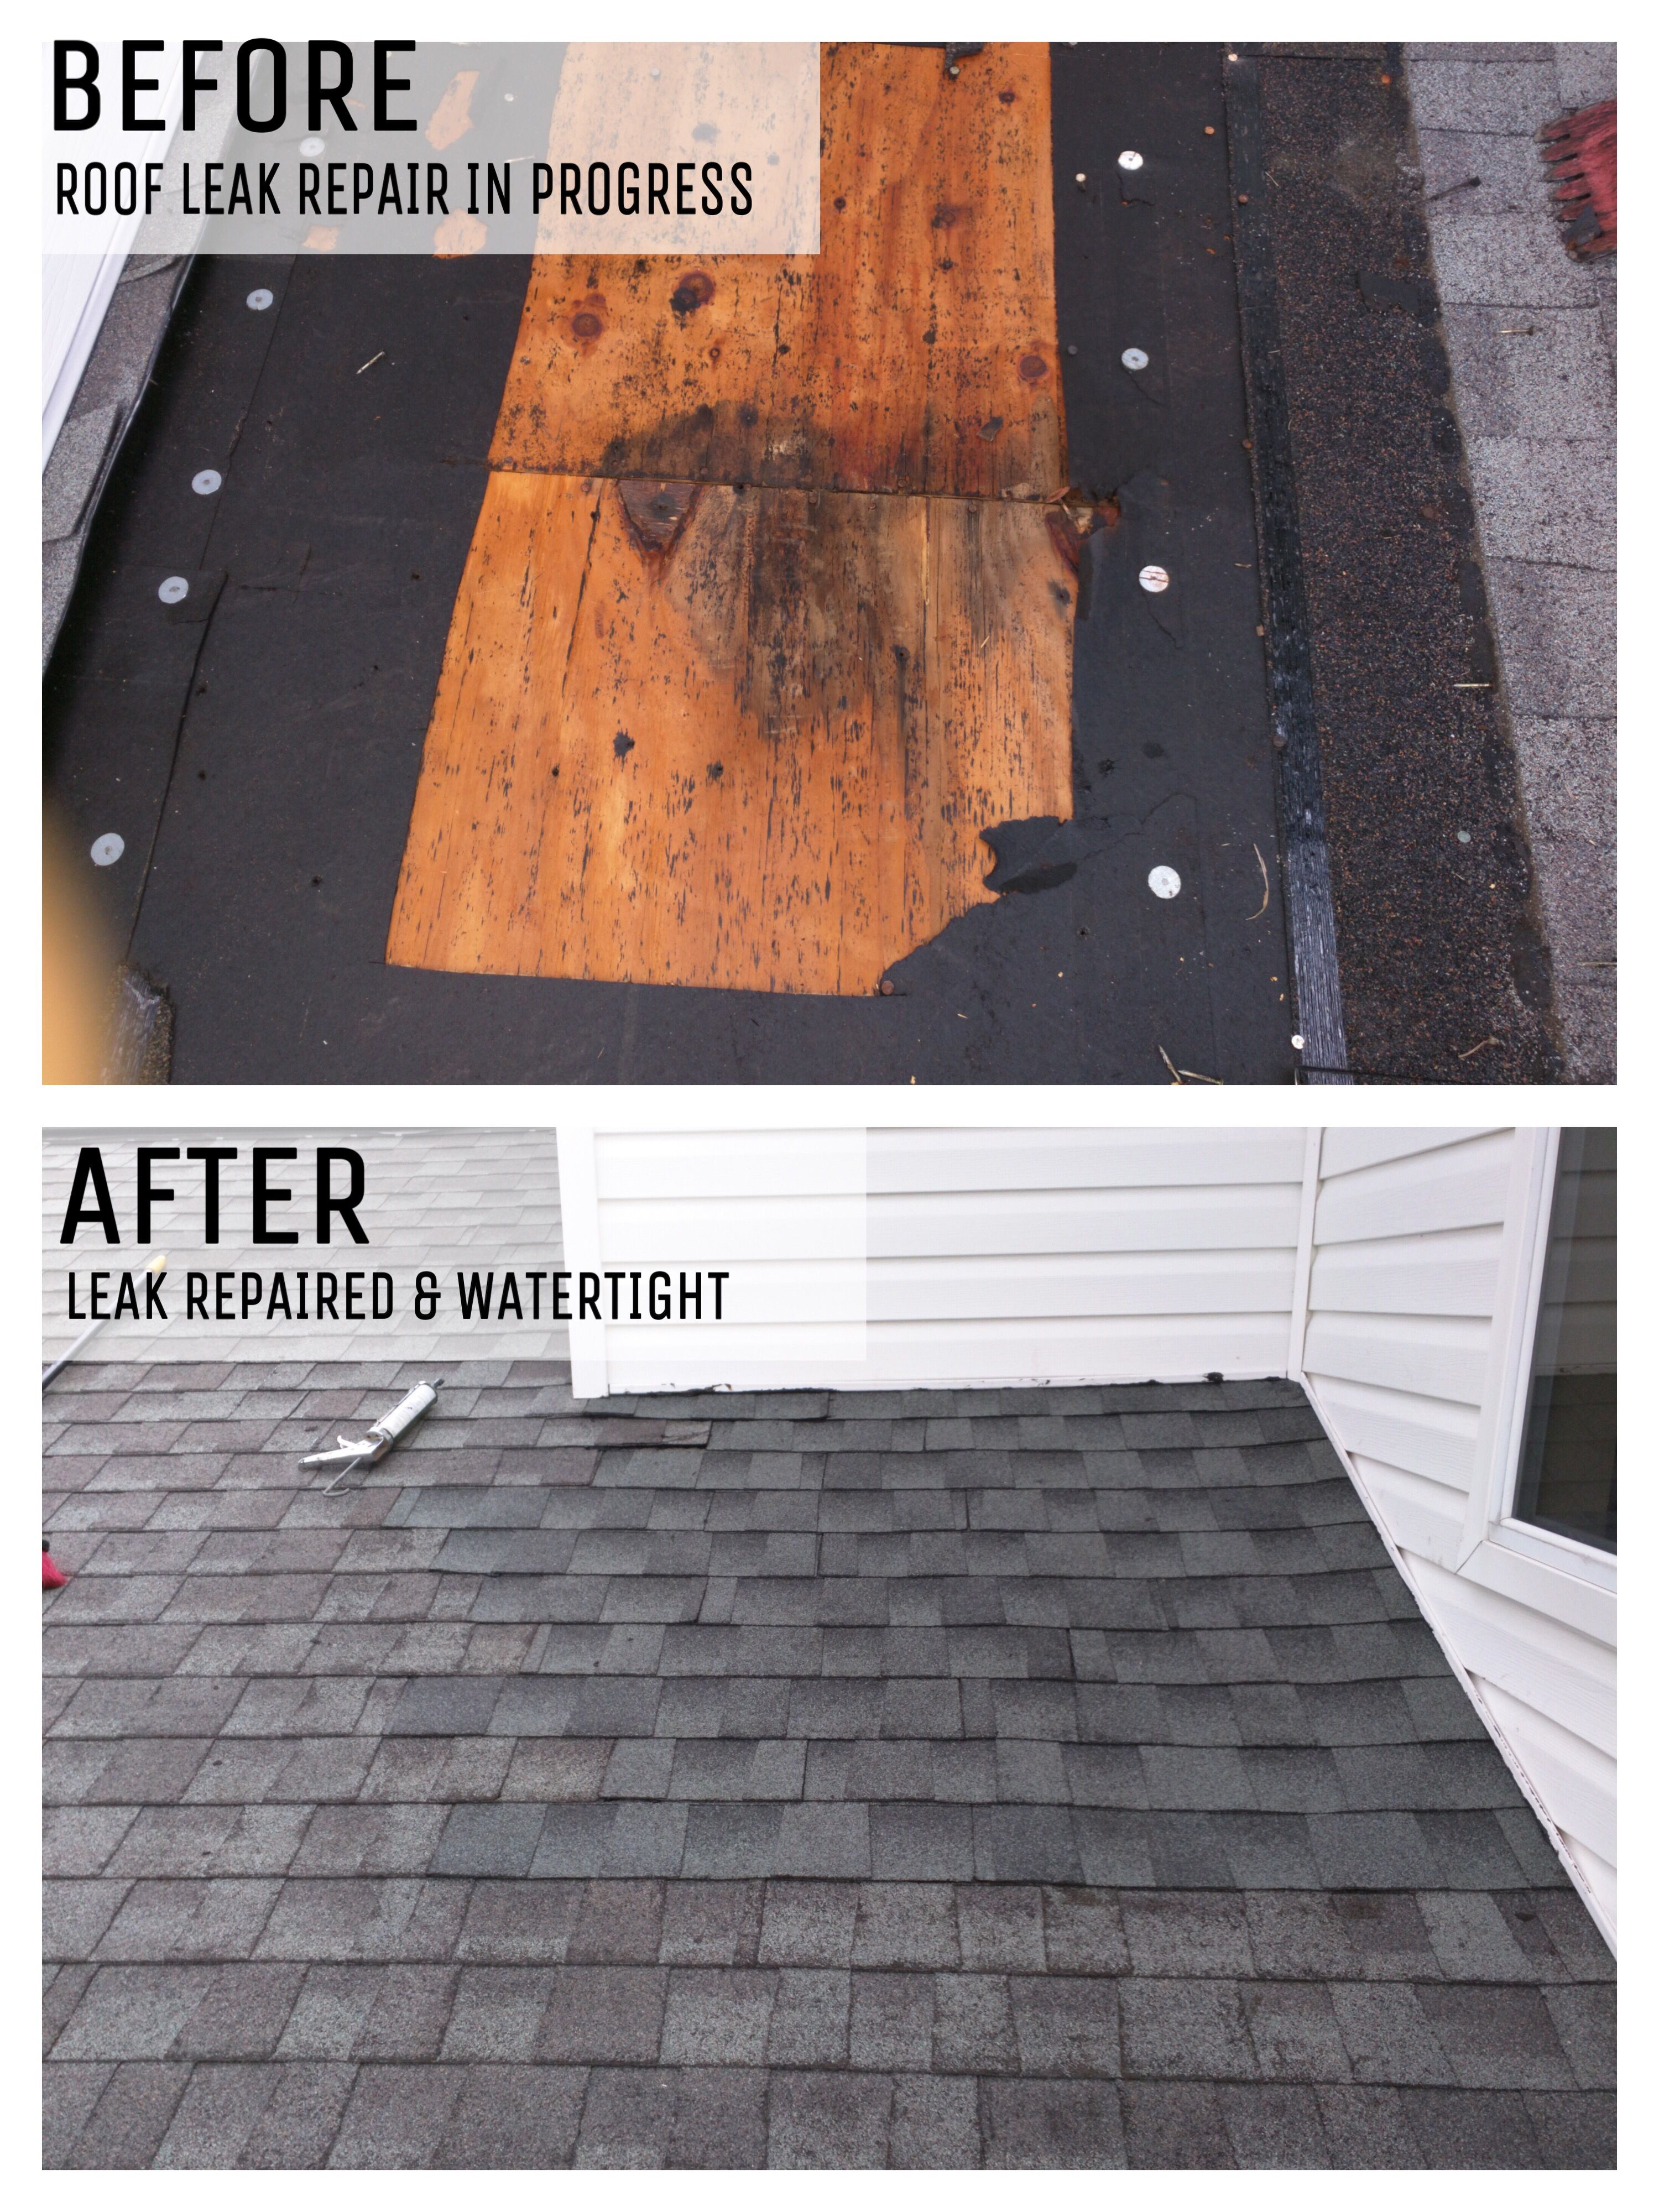 Residential Home Shingle Roof Leak Repairs Roof Leak Repair Leak Repair Leaking Roof